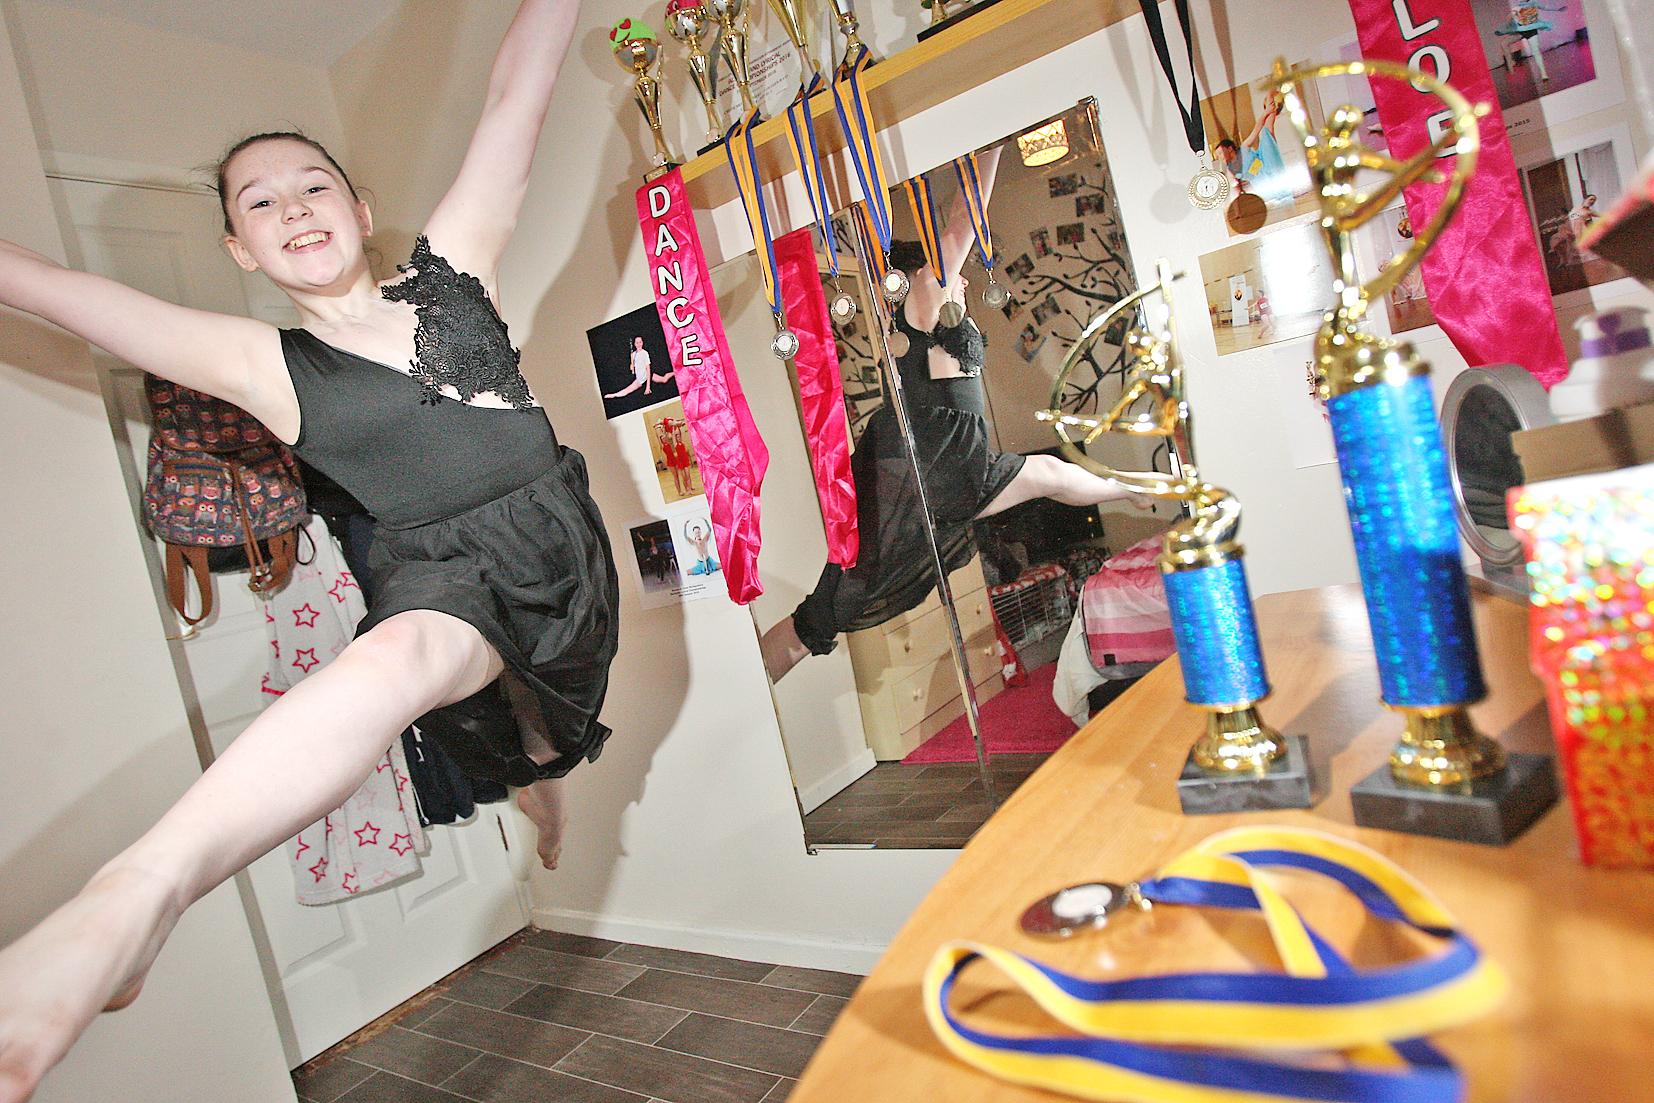 Chloe montgomery lyrical dance winner 3512mj161